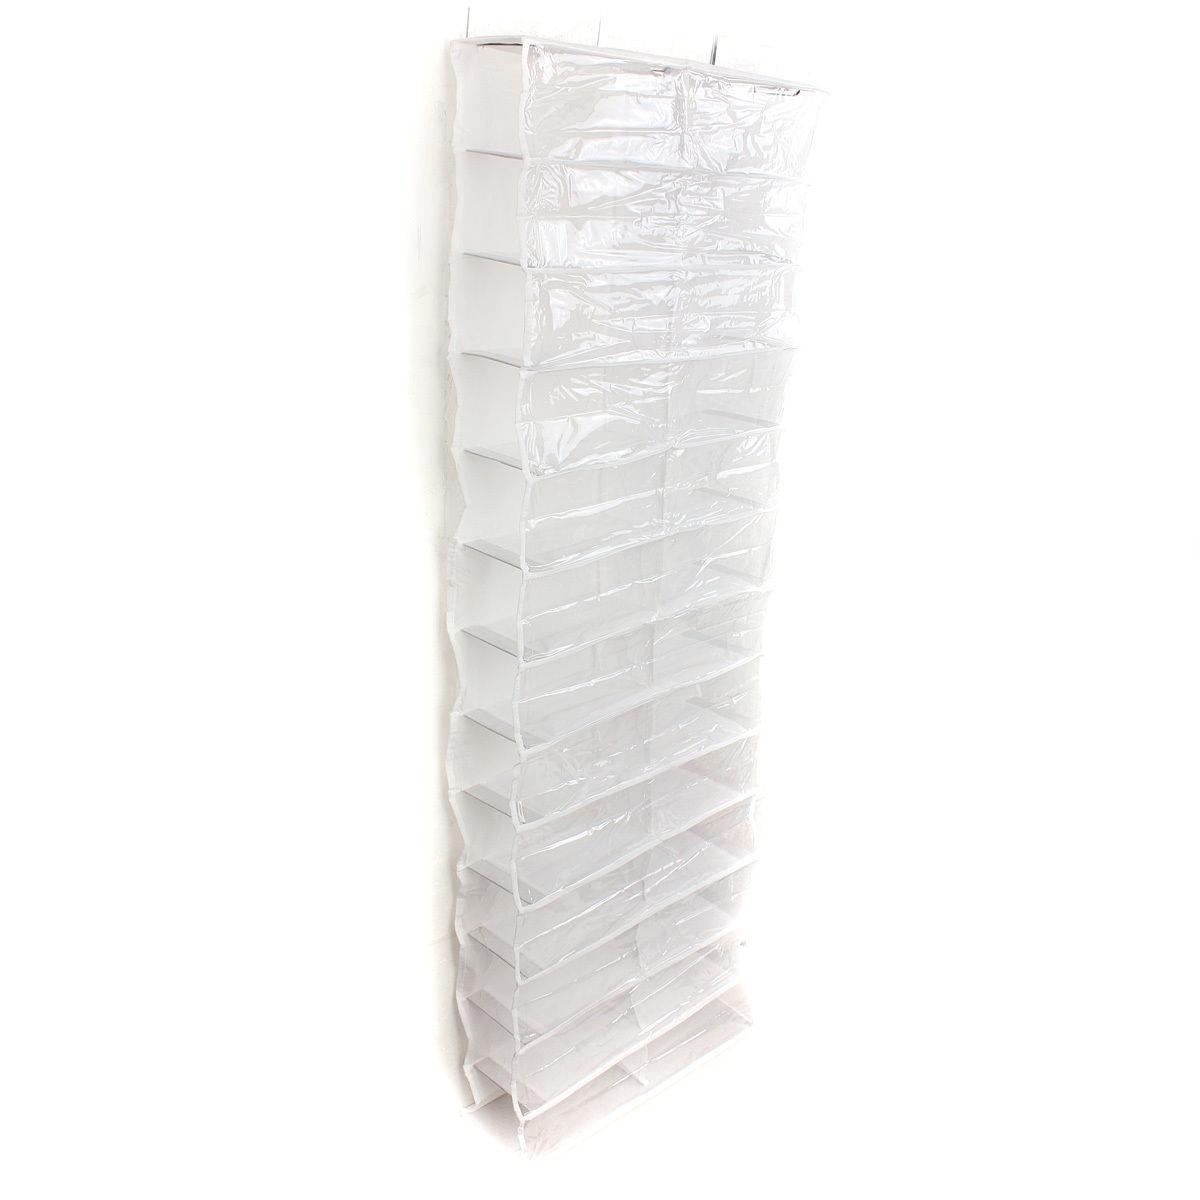 26 Pairs Over Door Hanging Stand Shoe Rack Shelf Storage Organiser Pocket Holder Creamy White Black